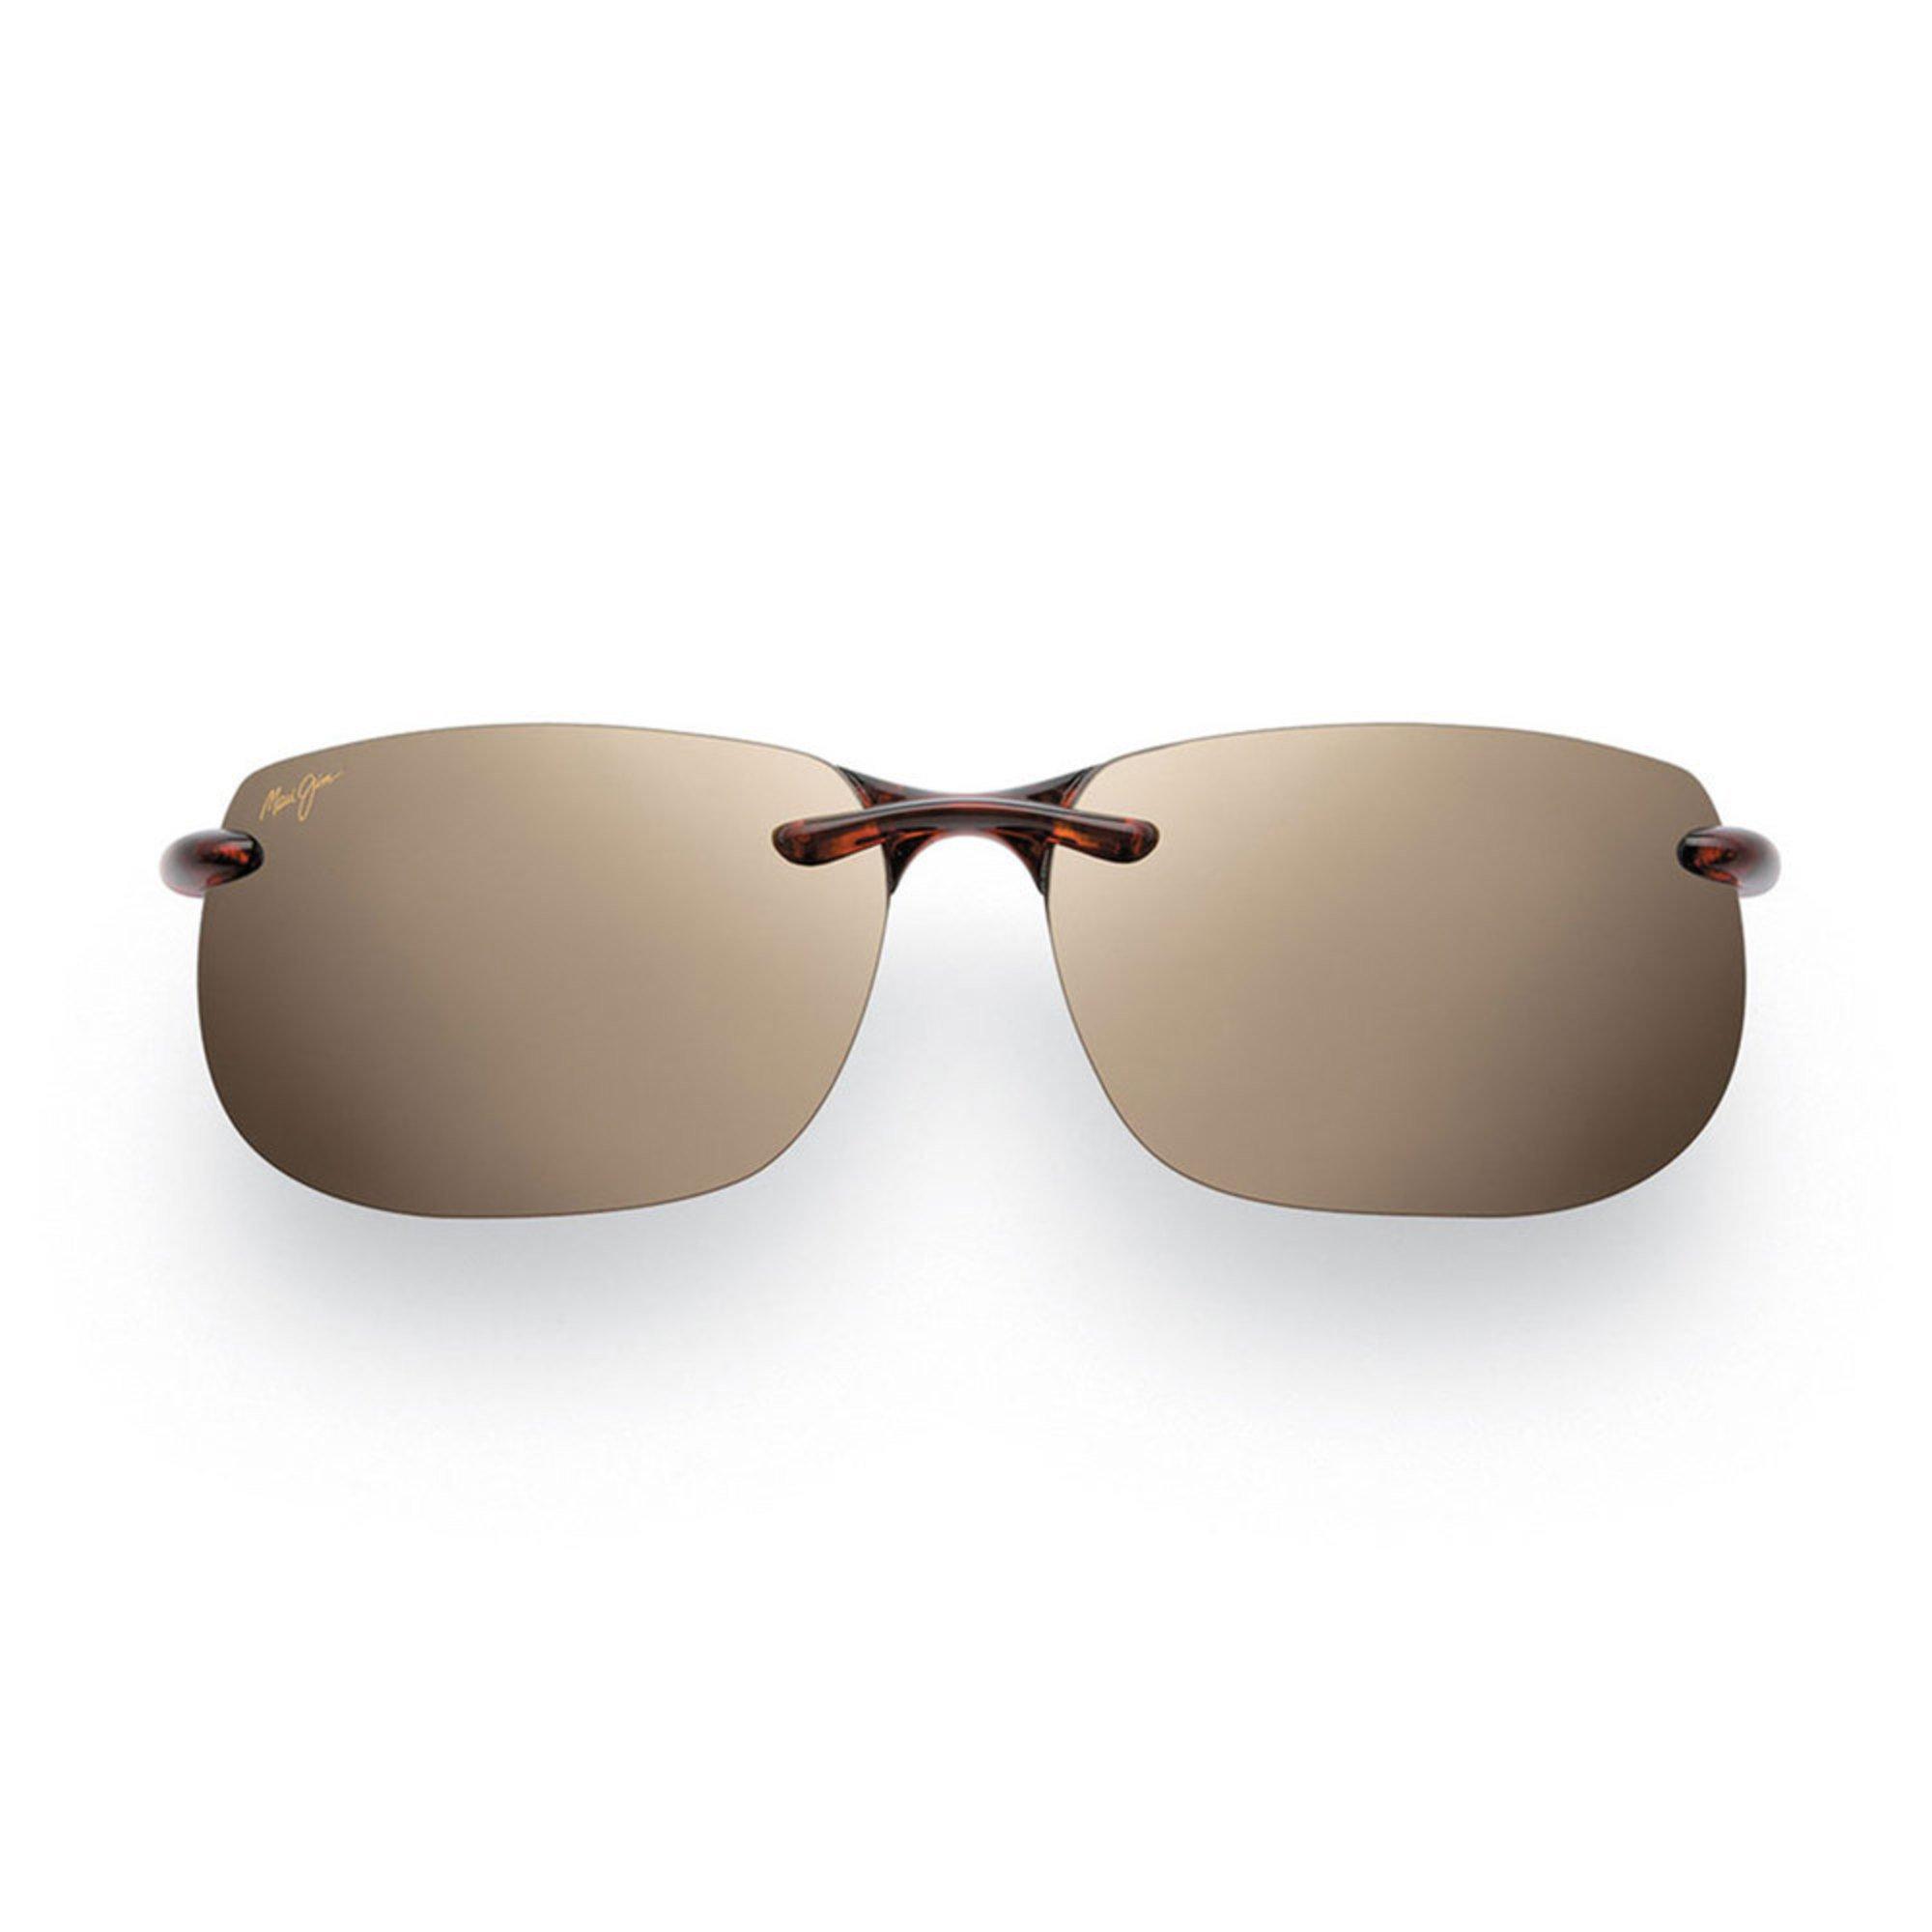 2f7f2f9755a9 Maui Jim Men's Banyans Tortoise Rimless Sunglasses | Men's ...